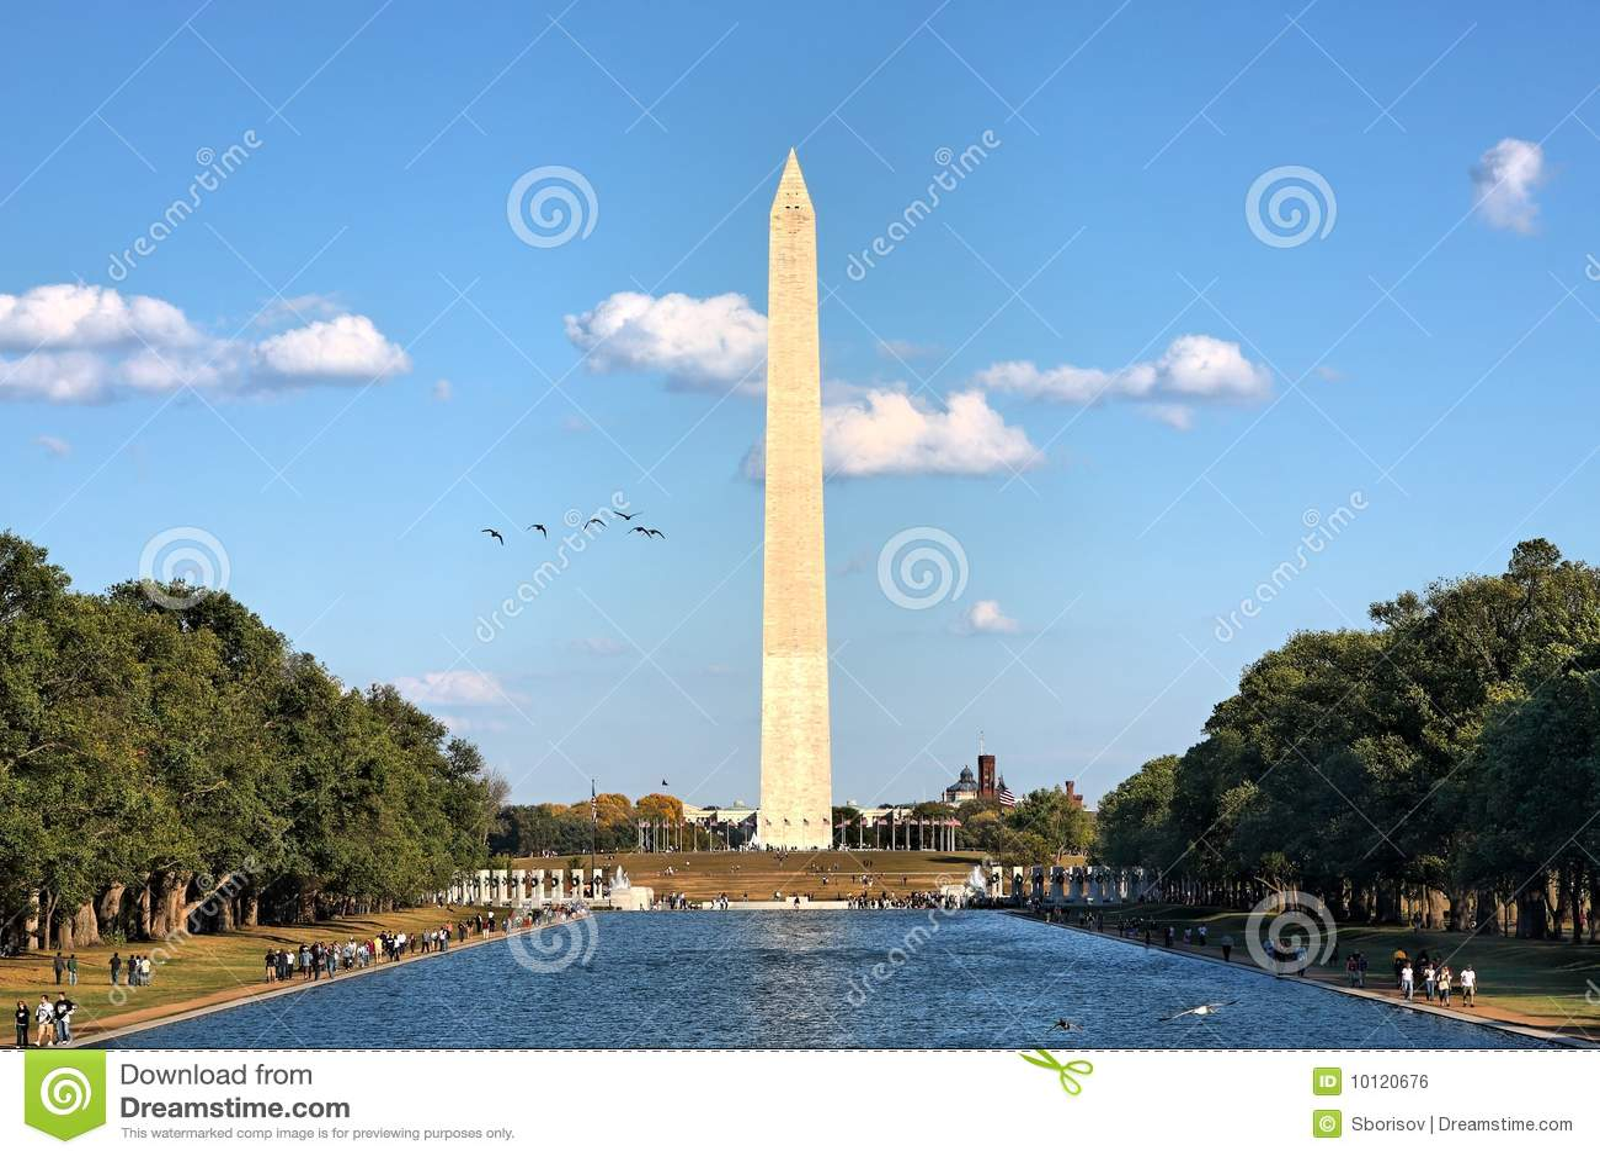 Washington Monument Stock Photo Image Of District Blue